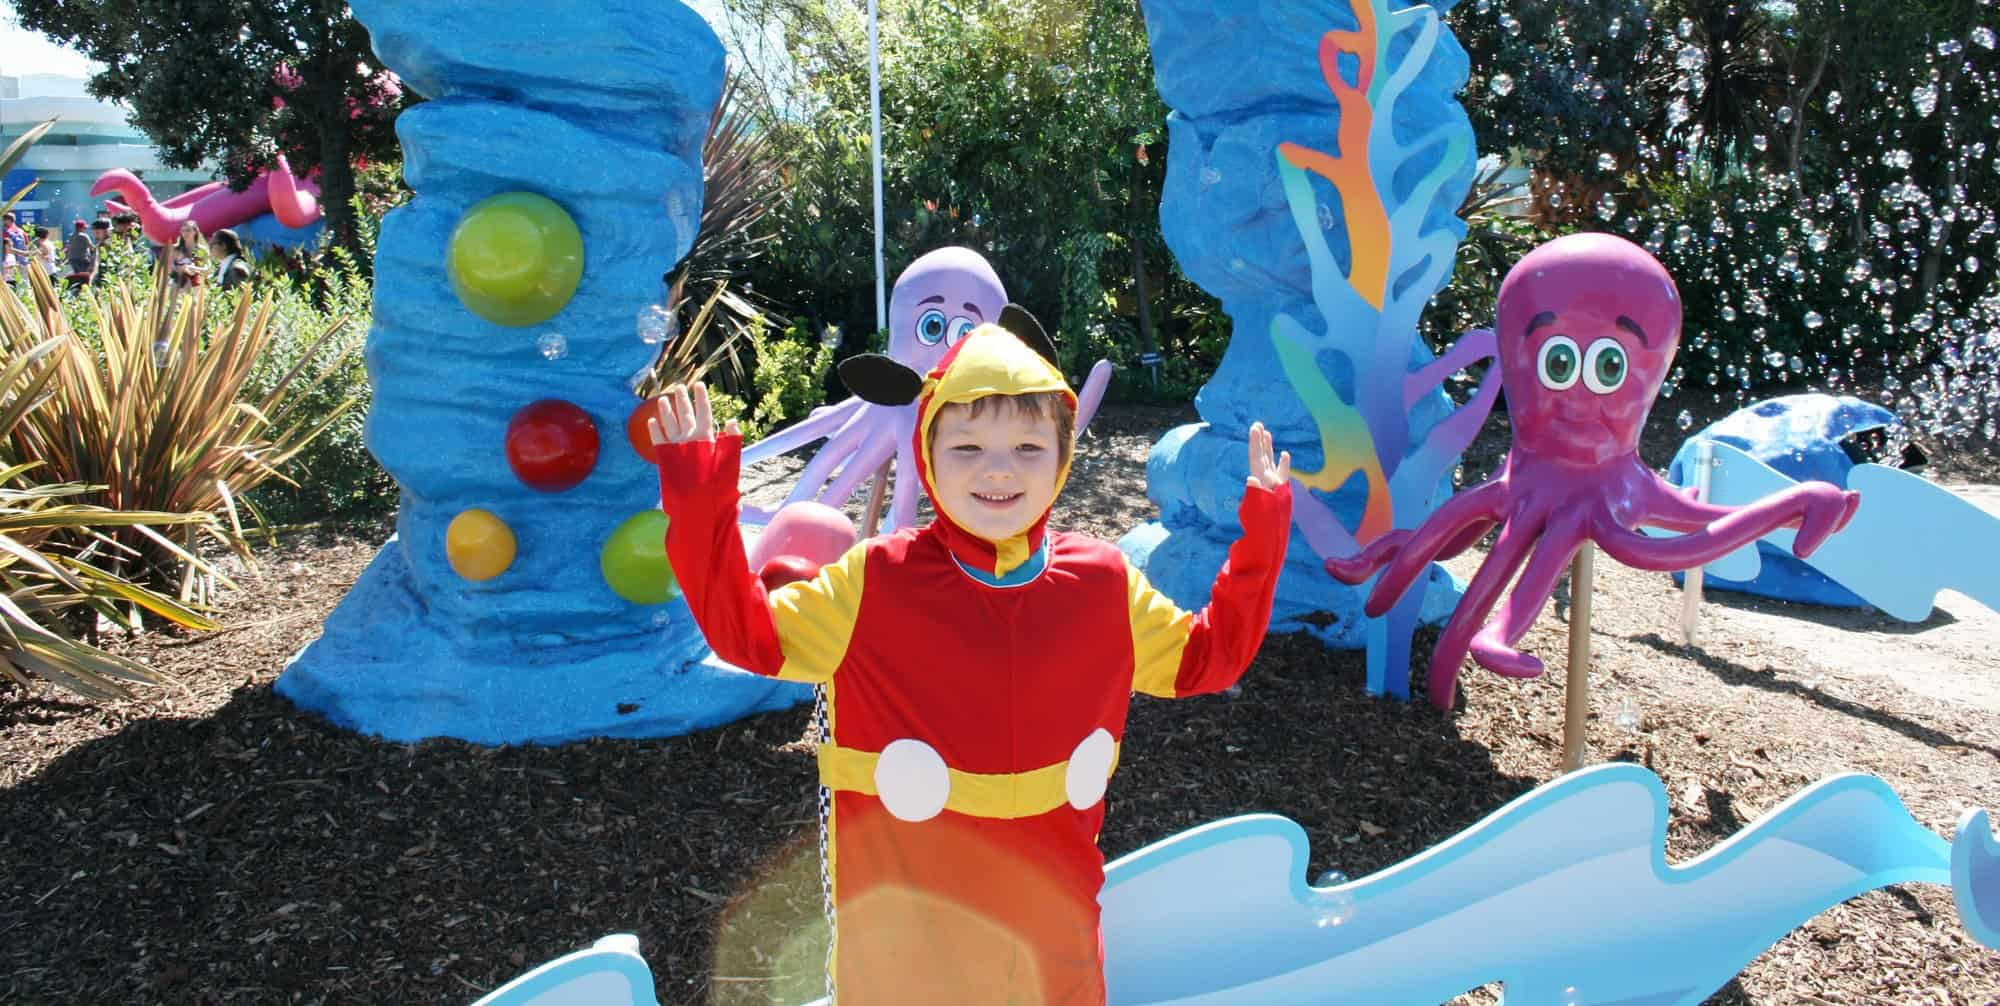 Halloween Spooktacular Seaworld.Family Fun At Seaworld San Diego Halloween Spooktacular